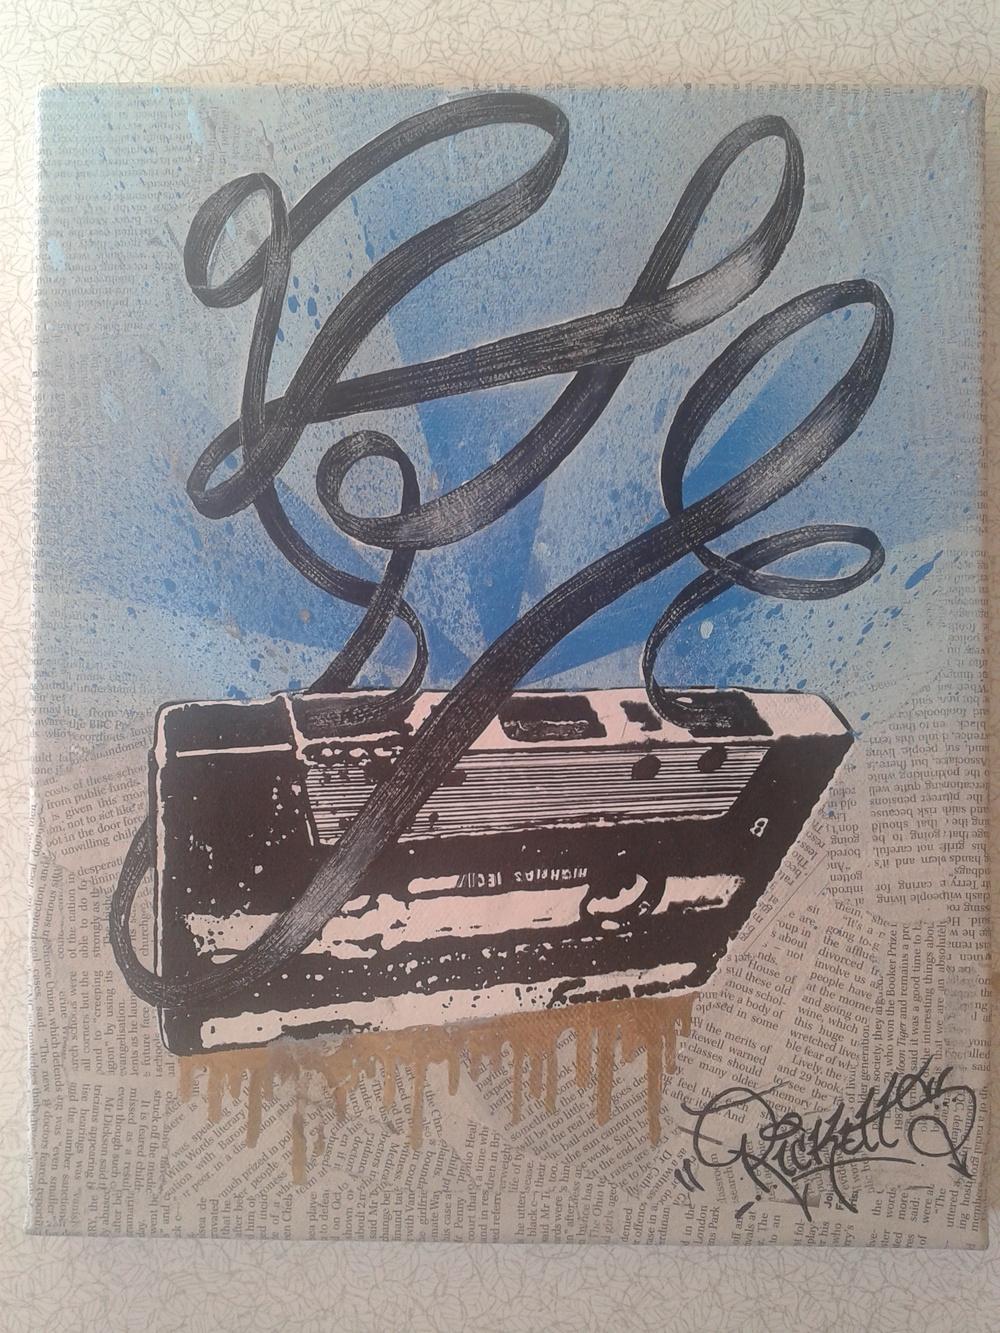 Loose Tape (2012)